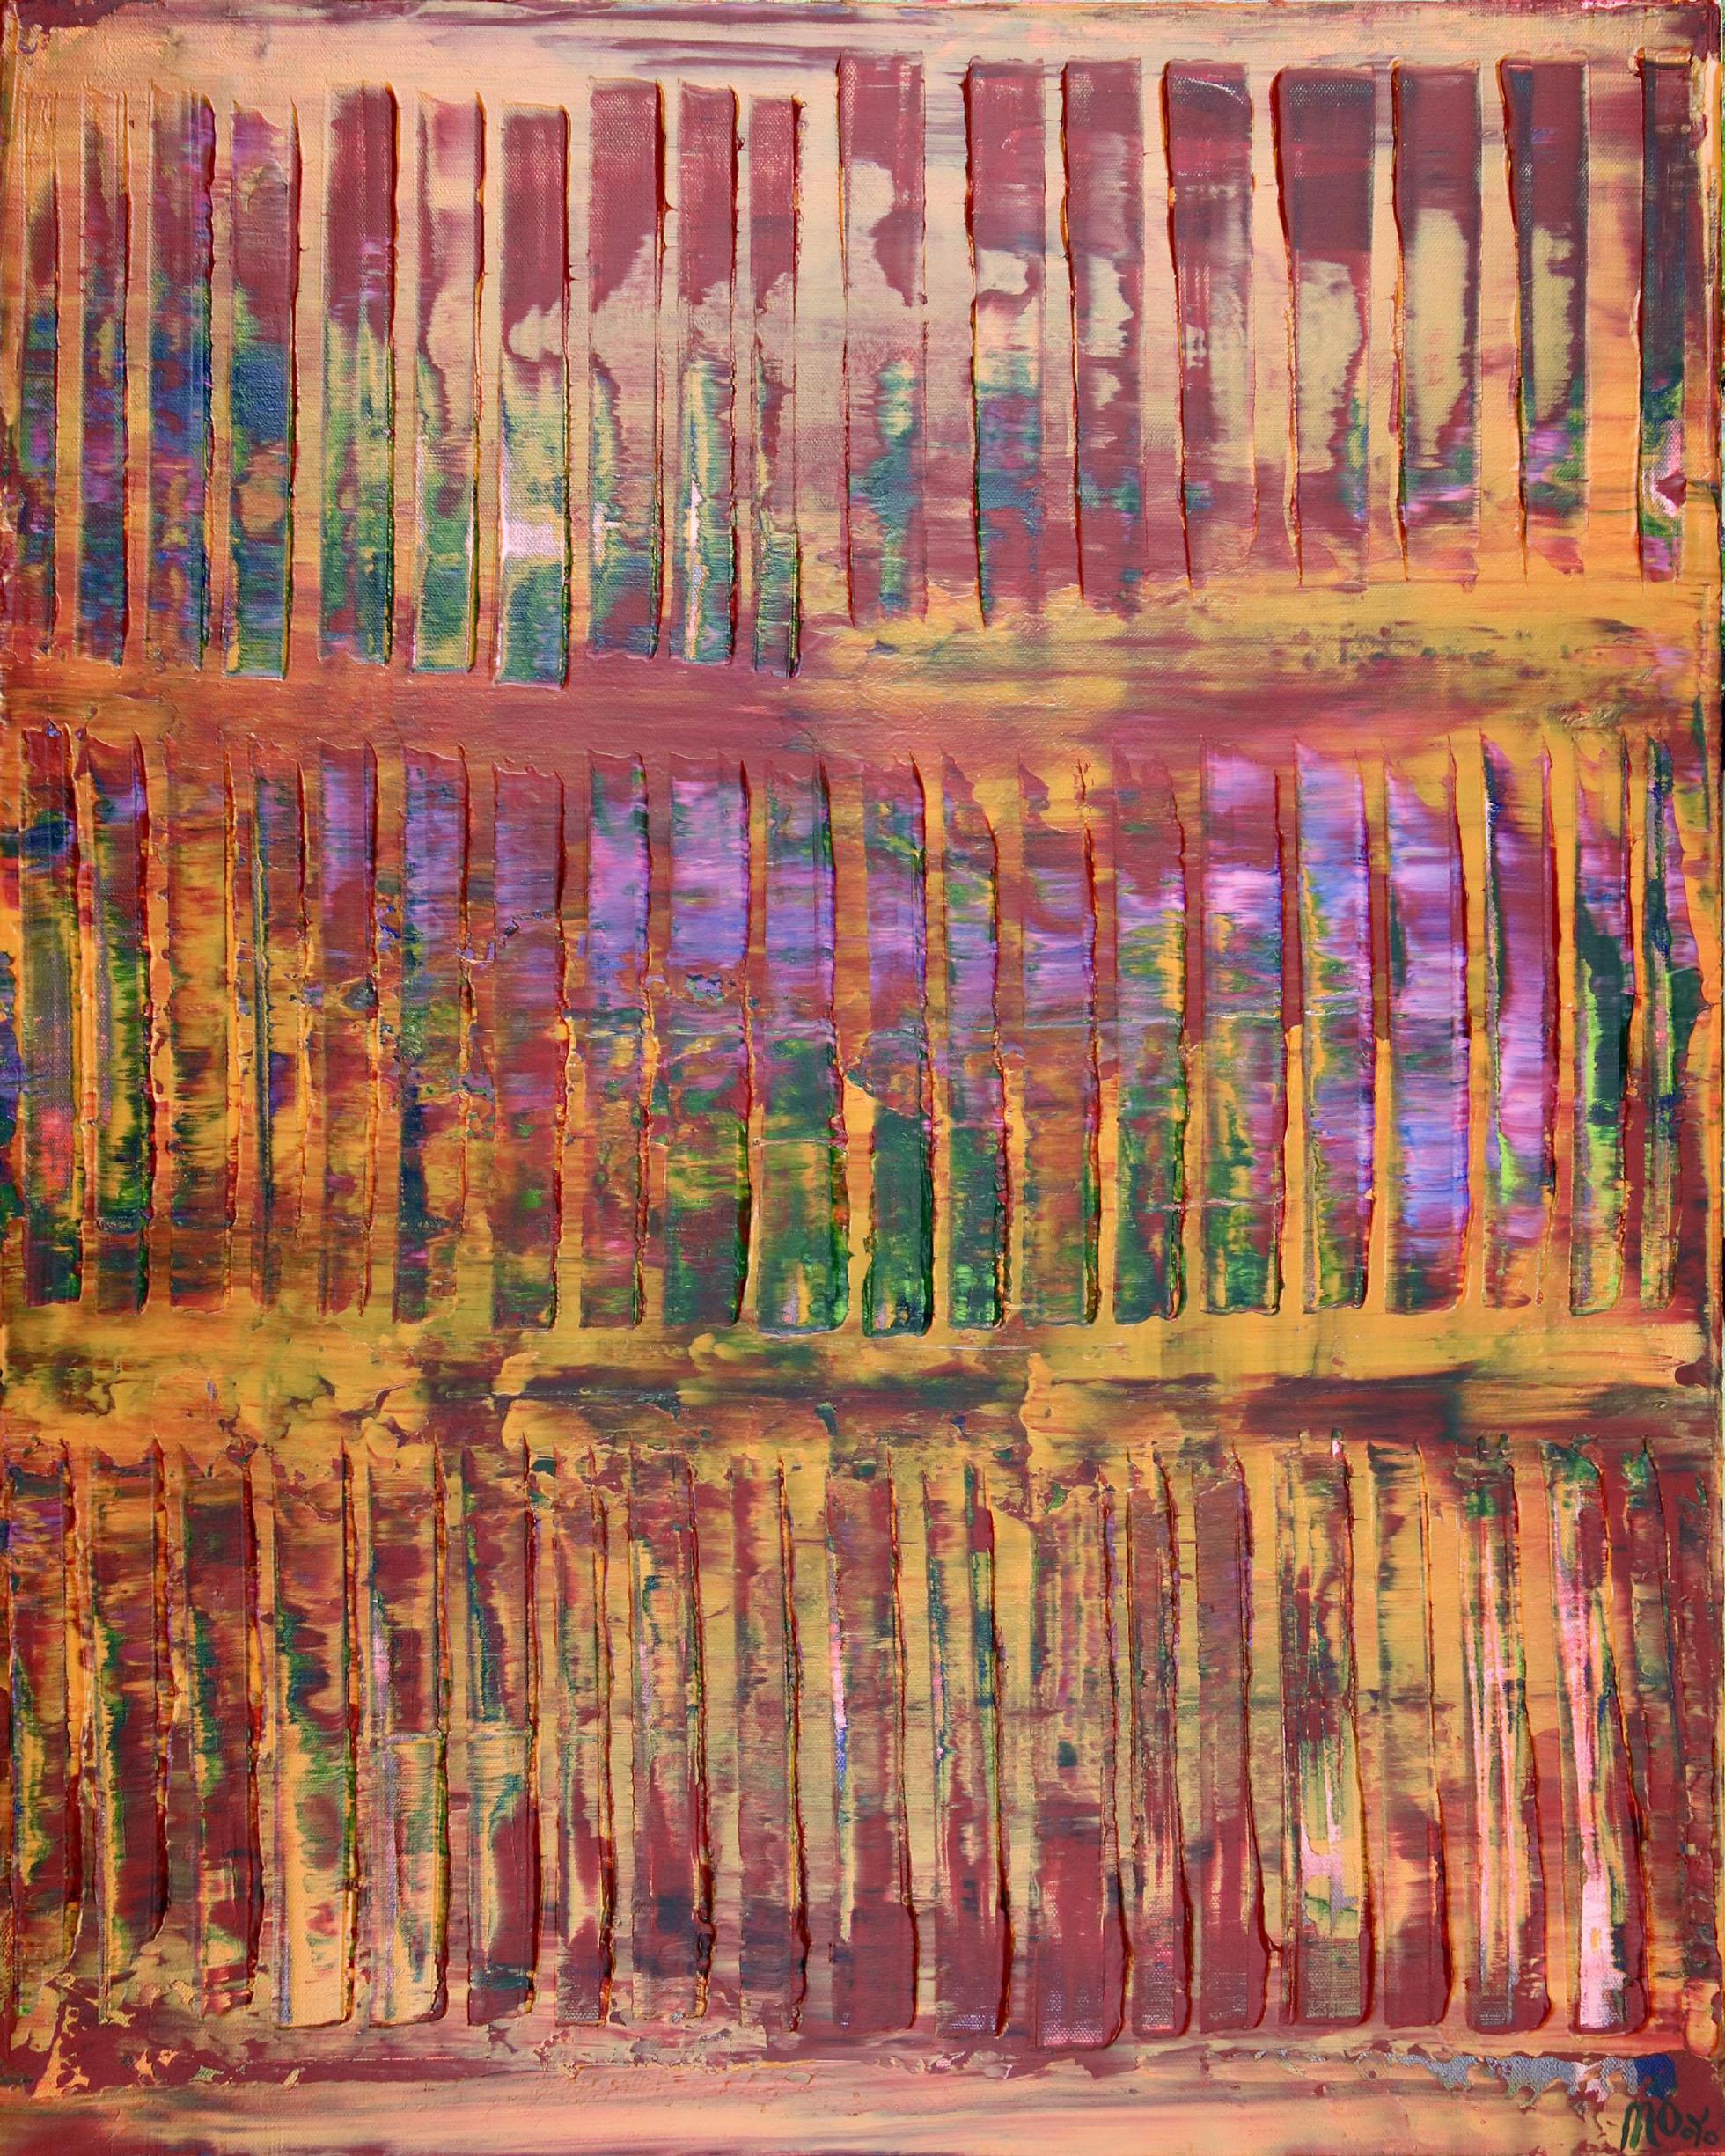 Full Canvas - Sunset intrusions (Orange Sky) 2 (2020) Abstract Acrylic painting by Nestor Toro